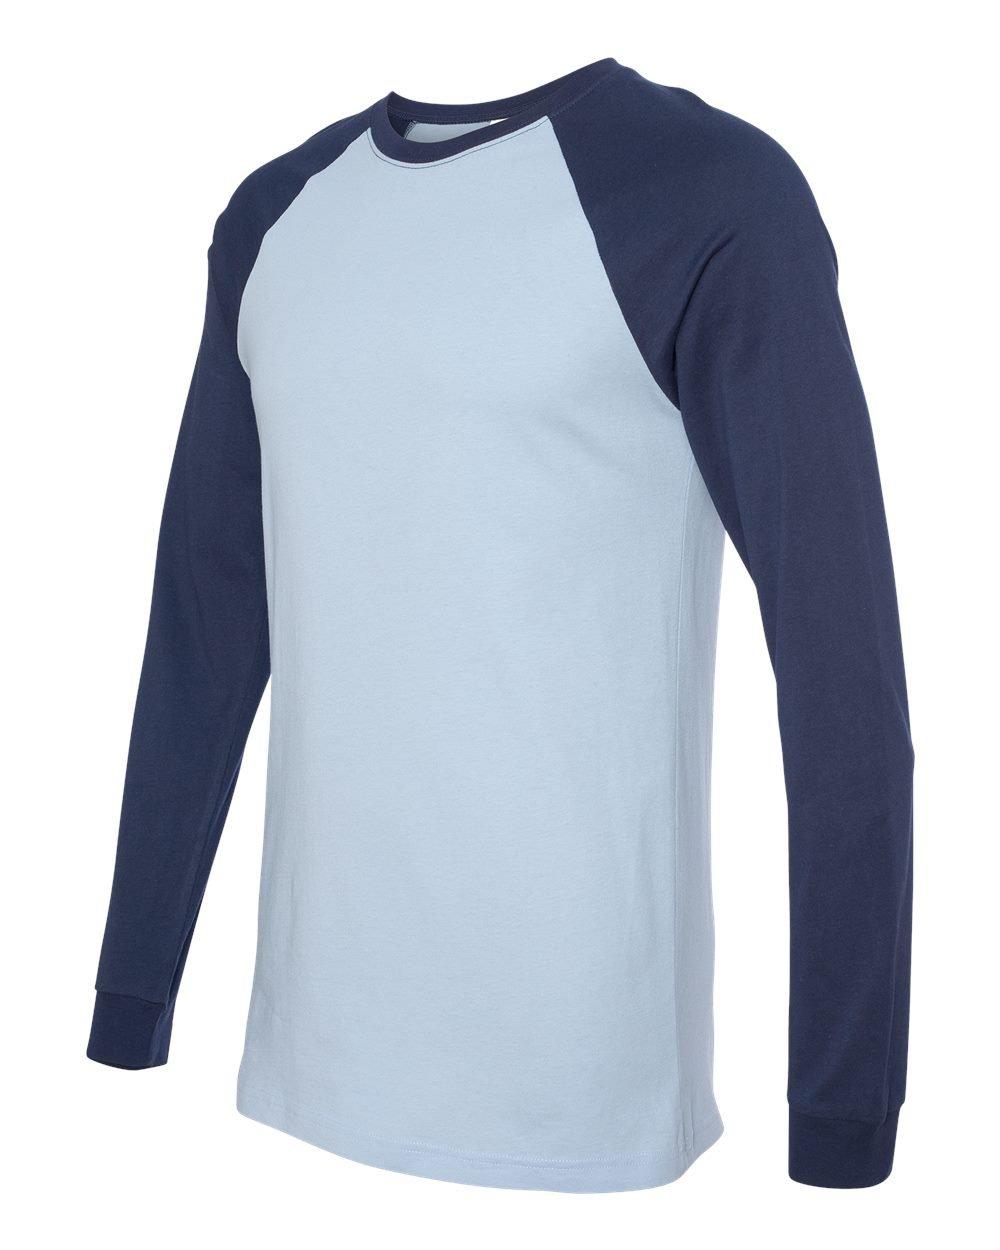 Bella and canvas long sleeve baseball jersey t shirt for Custom printed long sleeve t shirts